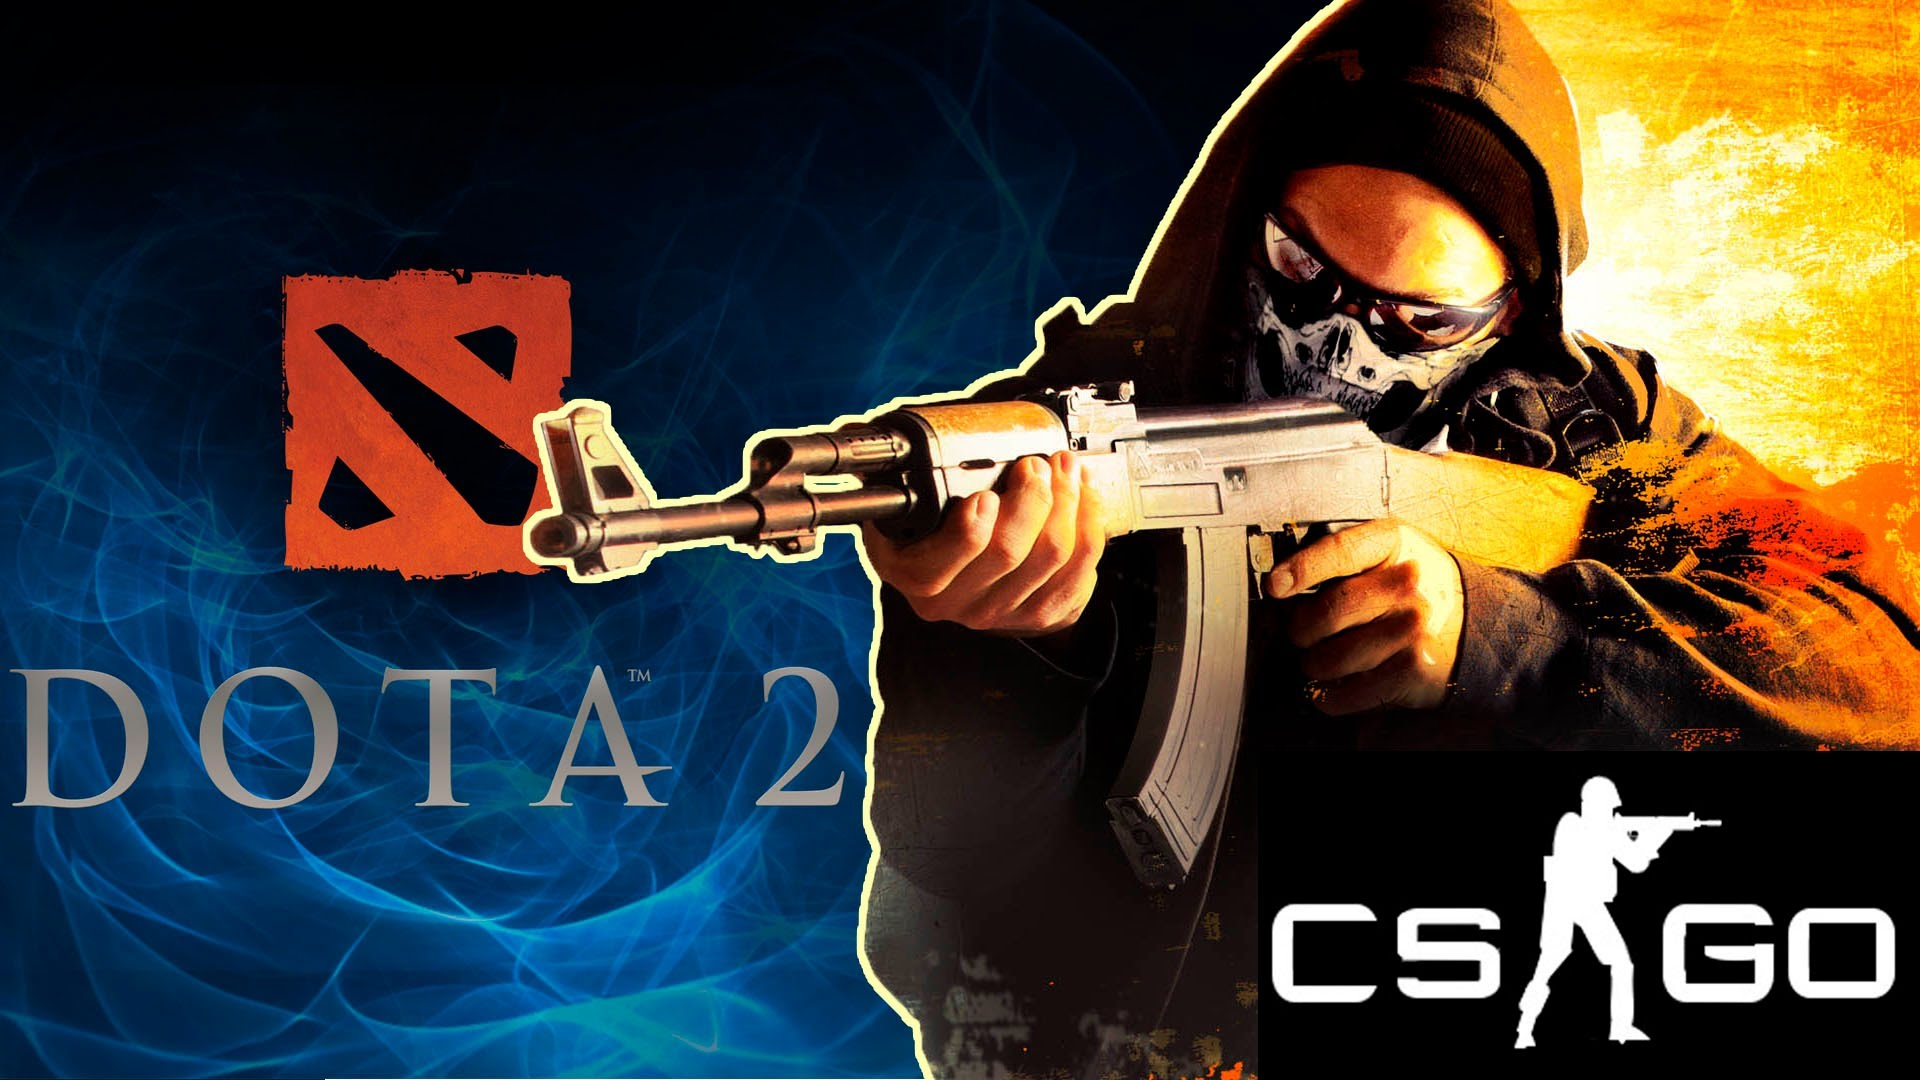 DOTA 2 CS:GO